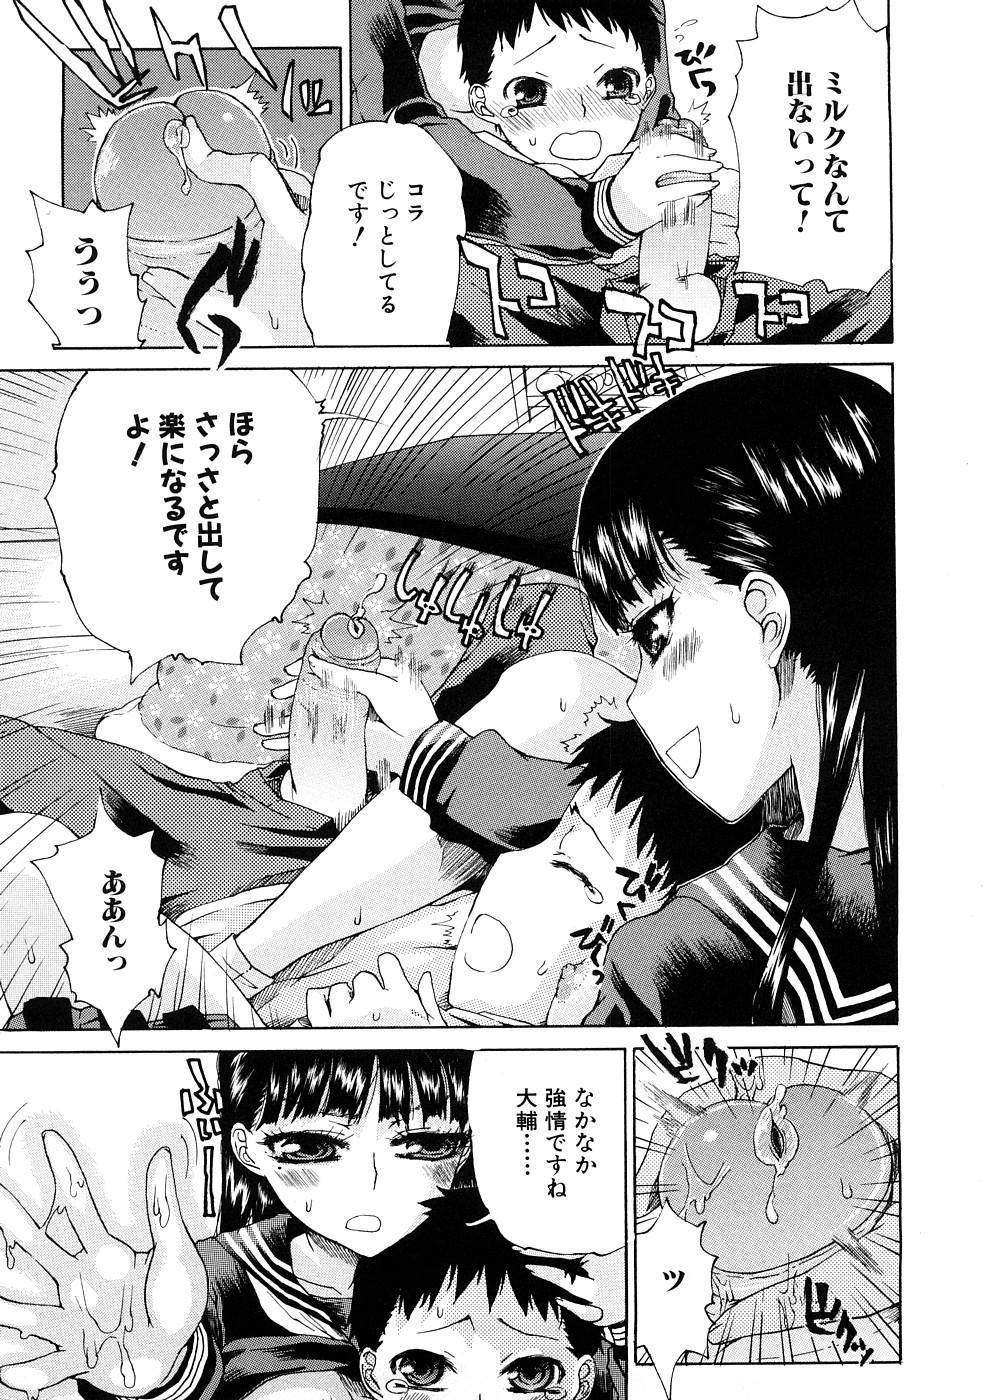 Ecchi de Jibunkatte de Kawaii Ko 74